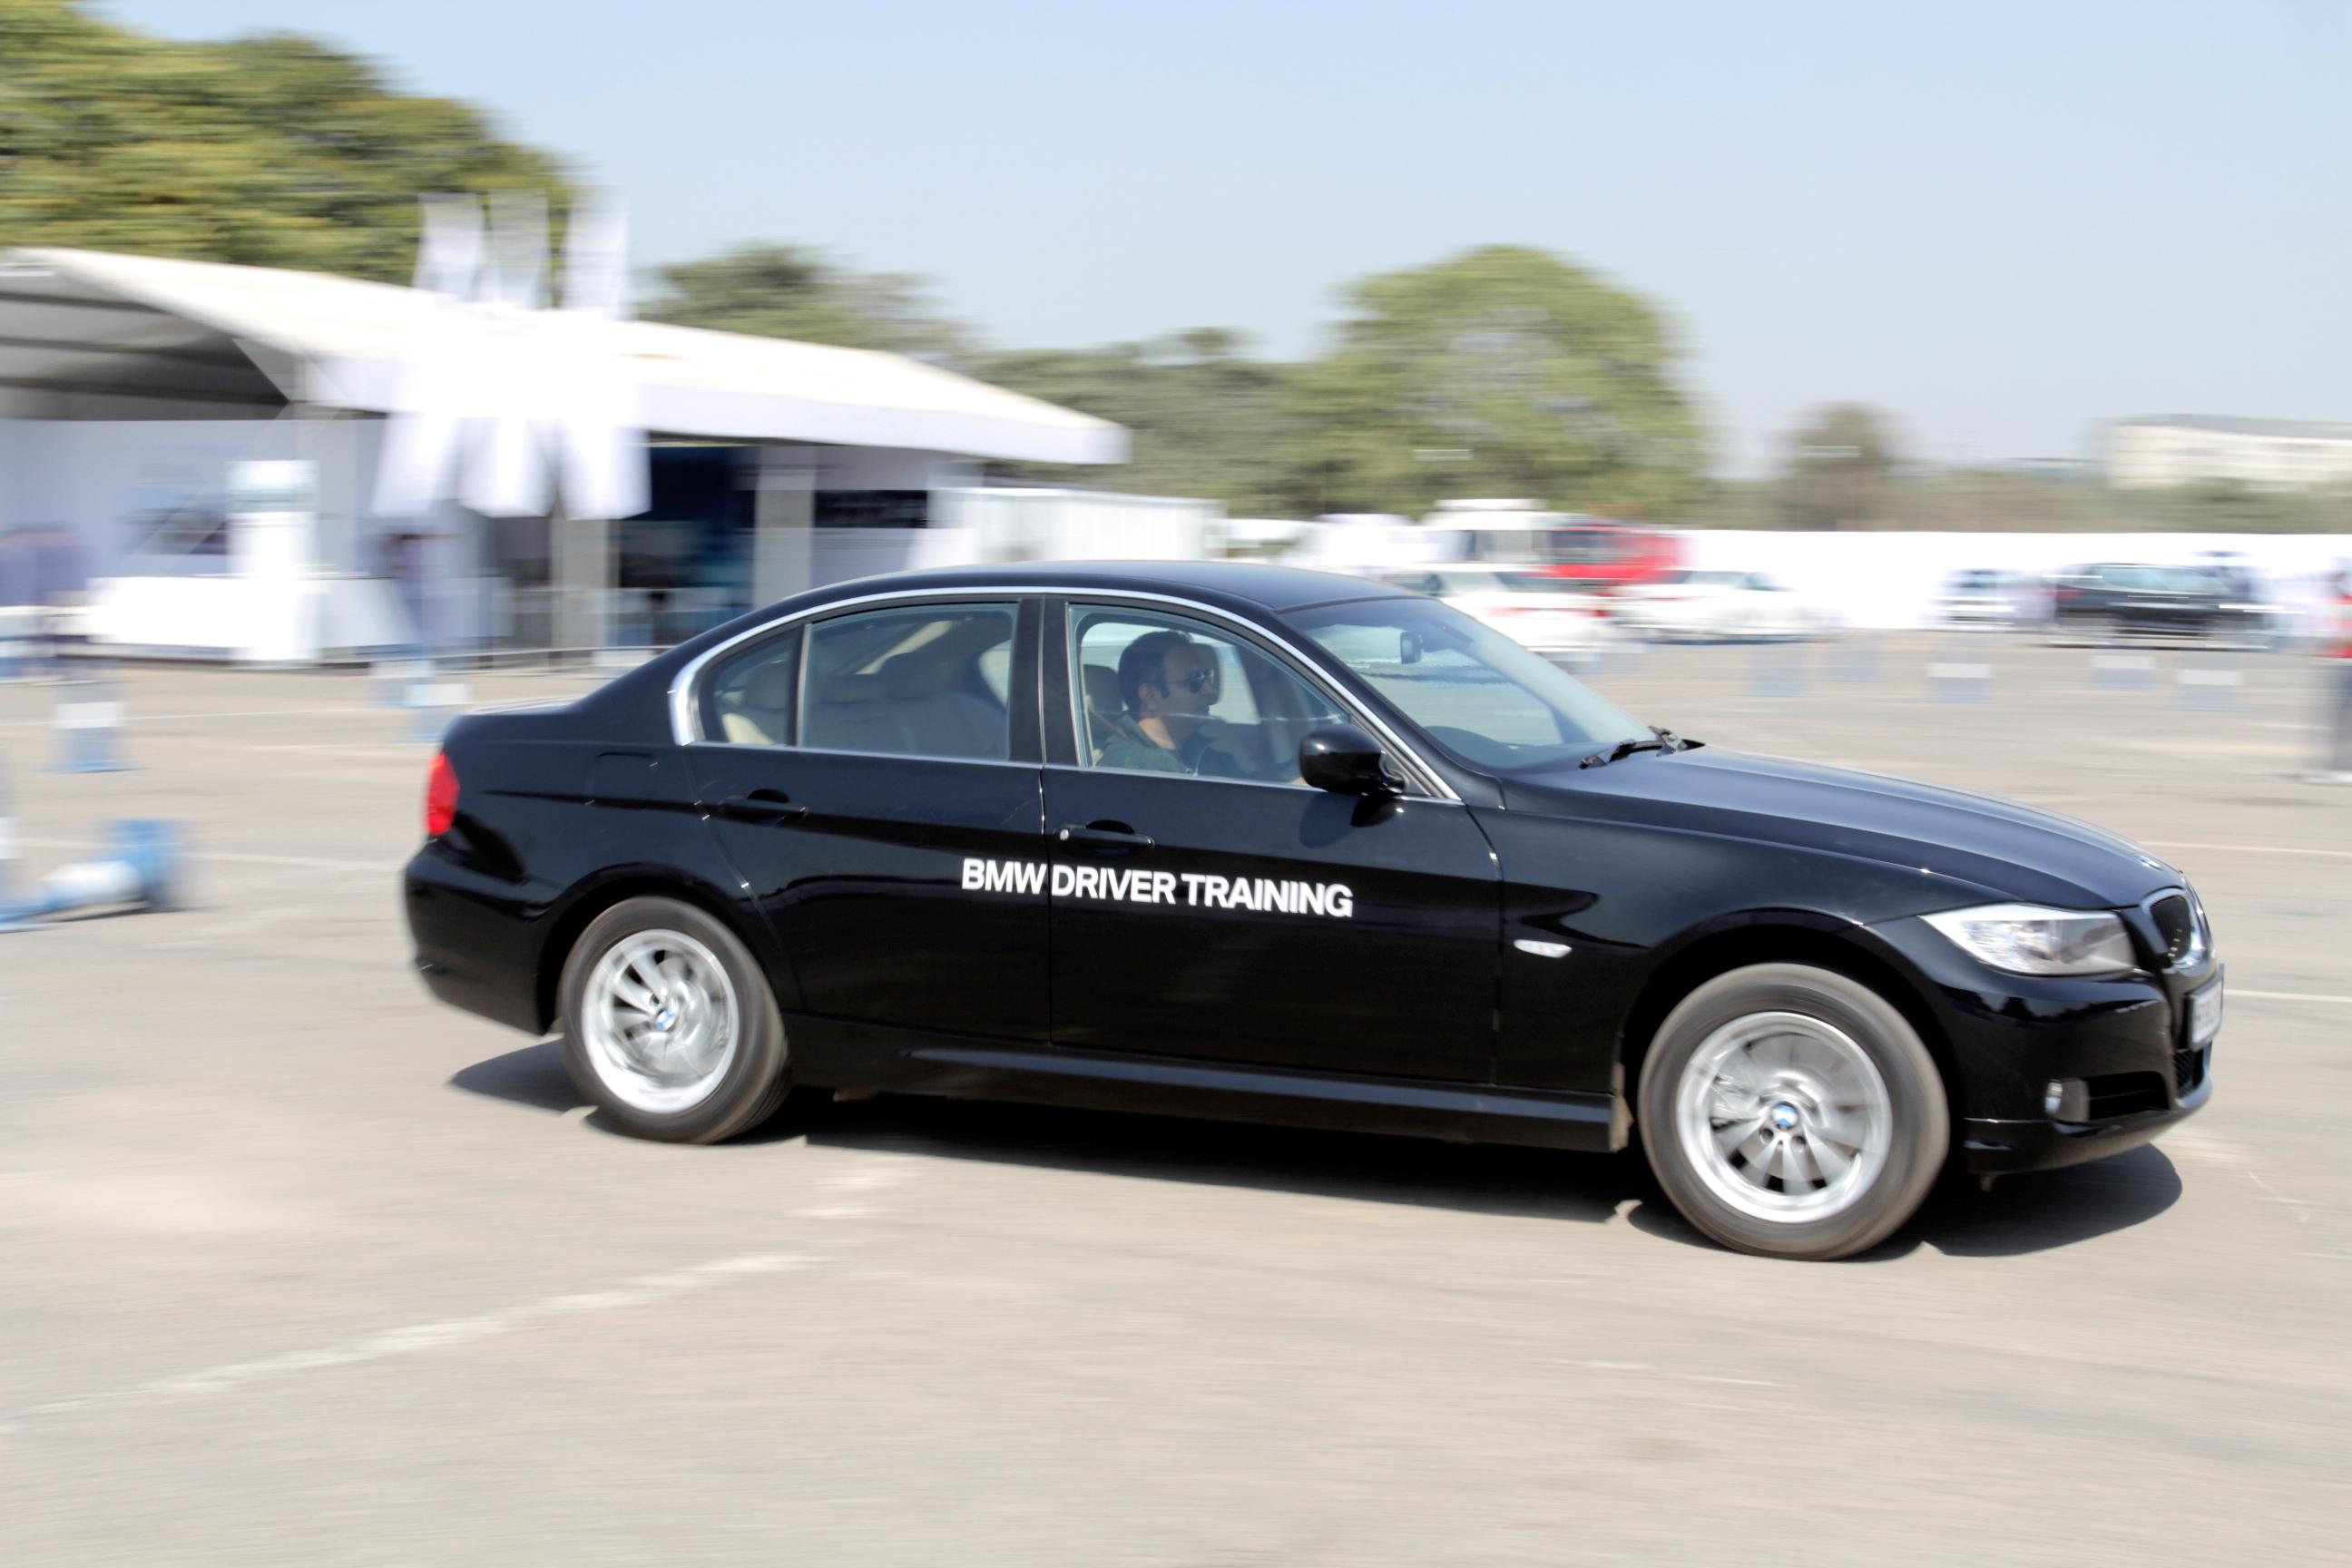 BMW-Driver-Training-1-1